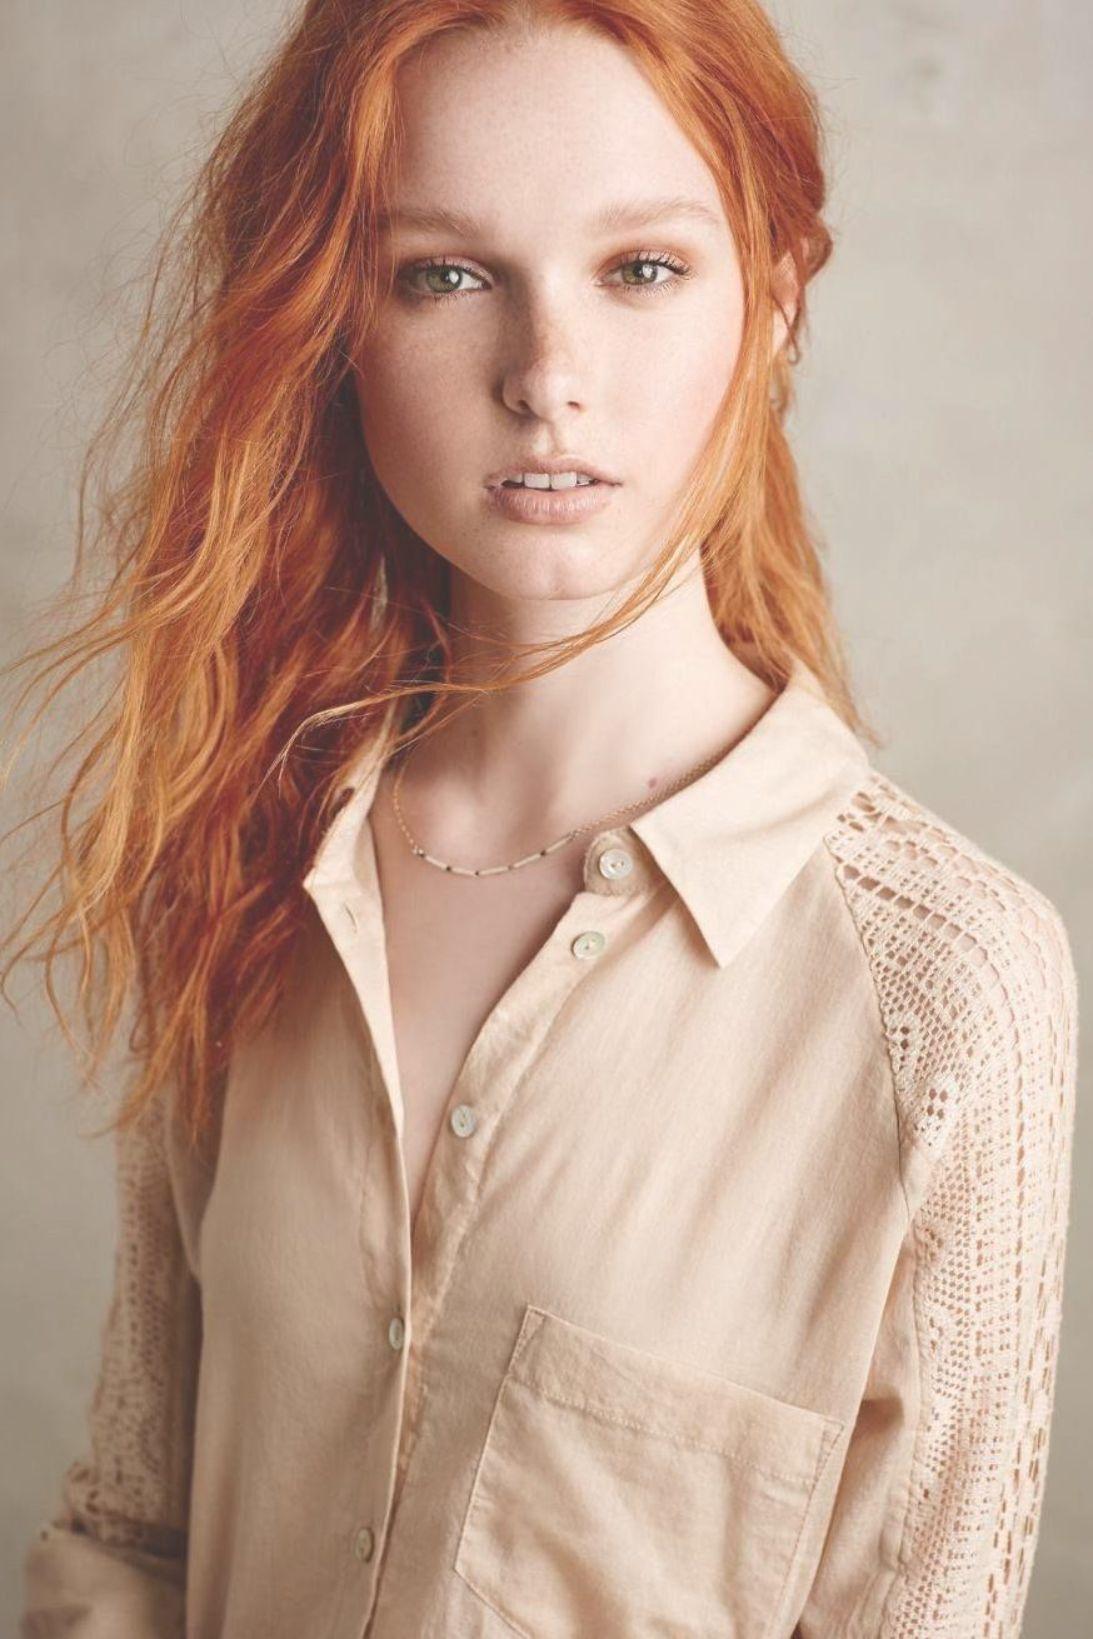 ❤️ Redhead beauty❤️ beautiful redhead women, pretty redhead girl, redhead model #redheadma…   Beautiful women pictures, Redhead beauty, Beautiful women photography